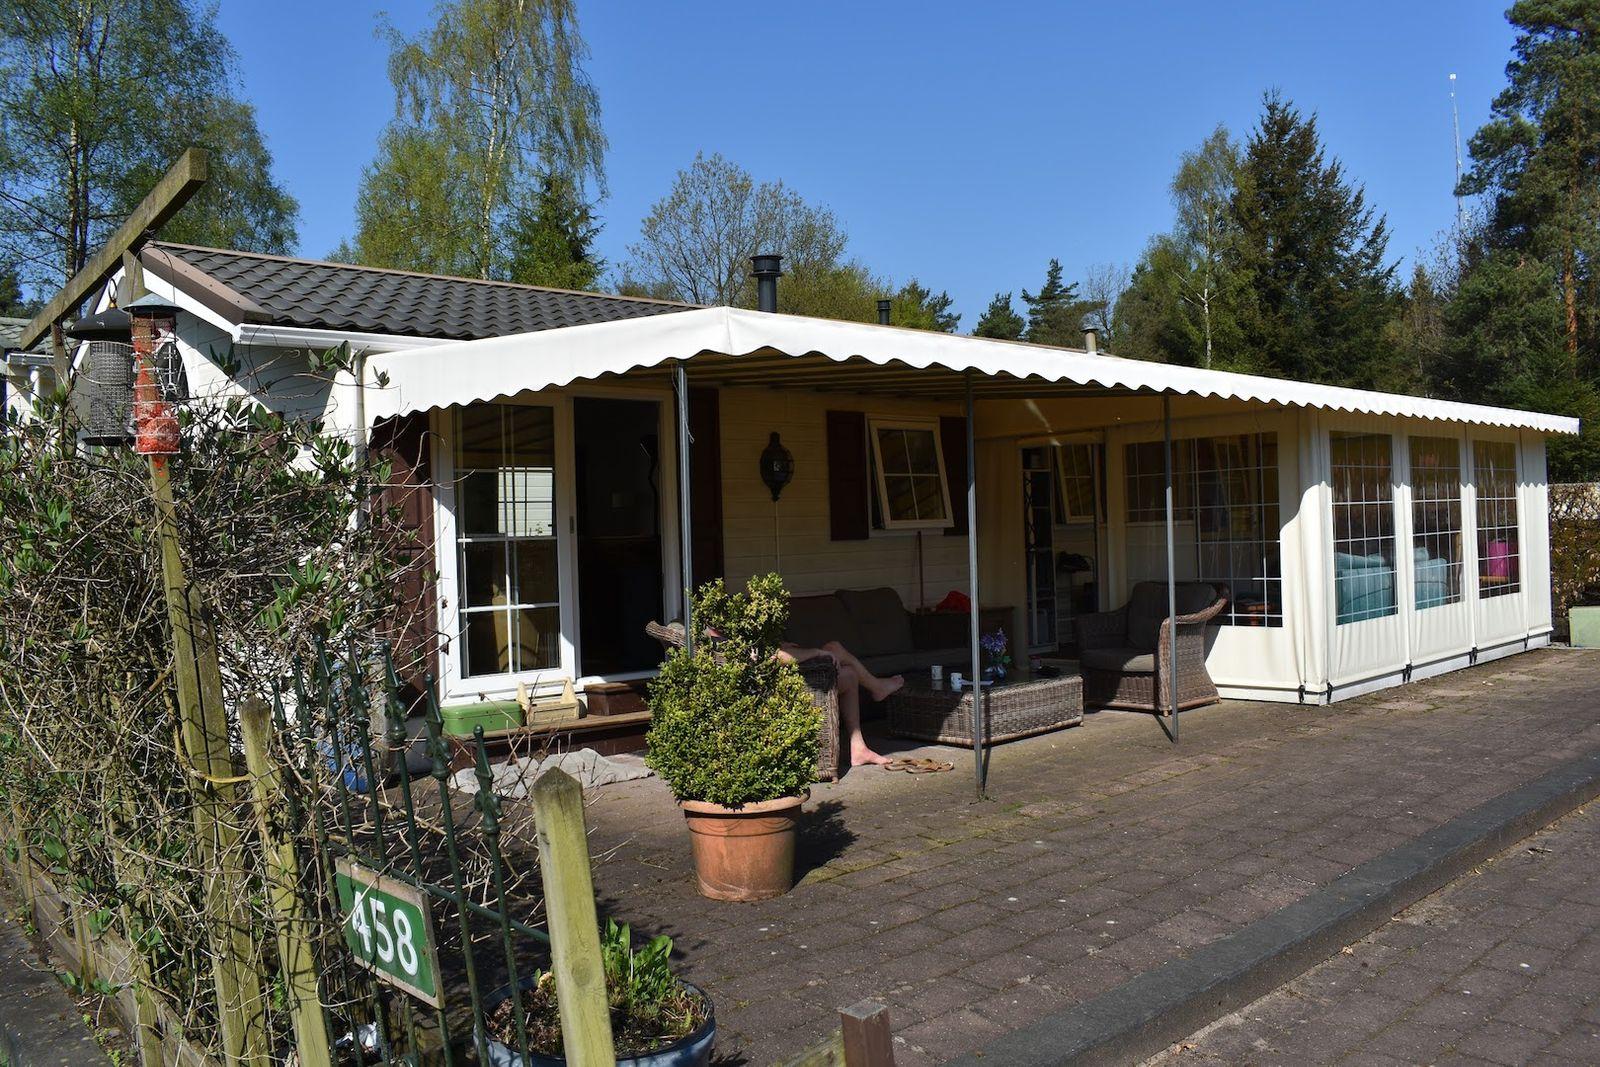 Spoekweg 49-458, Beekbergen